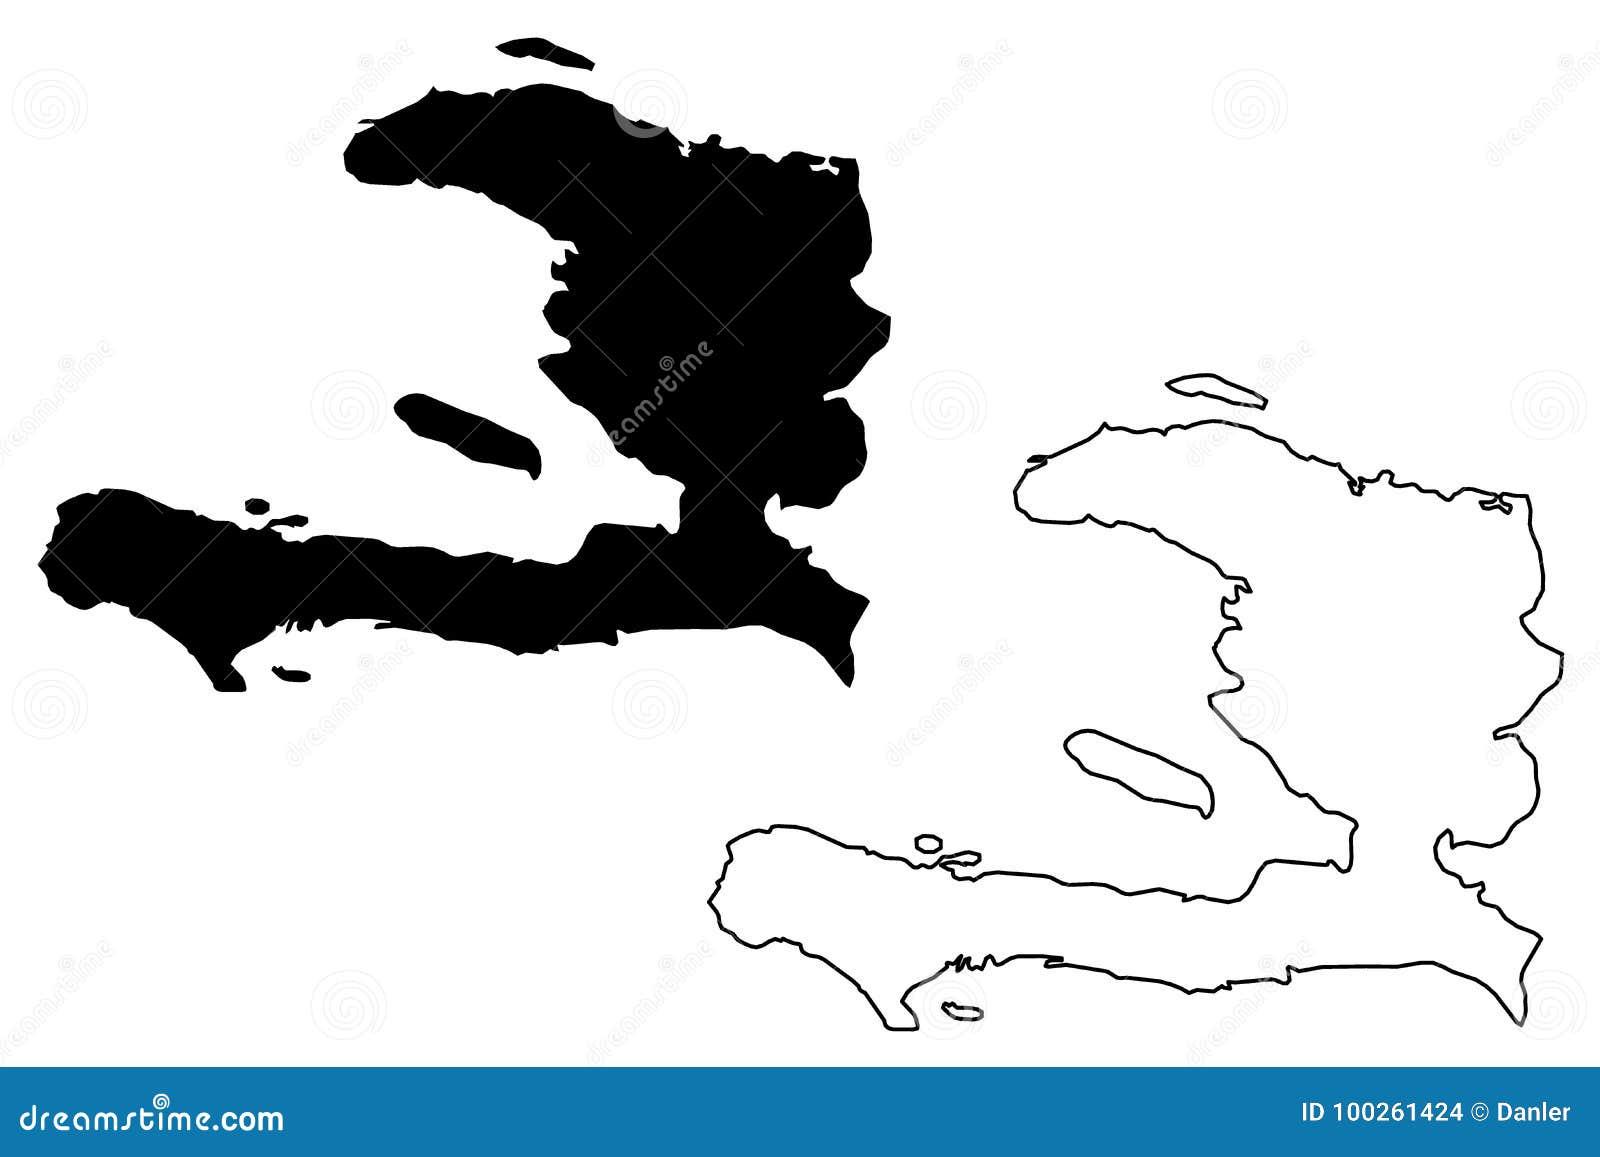 Vetor do mapa de Haiti